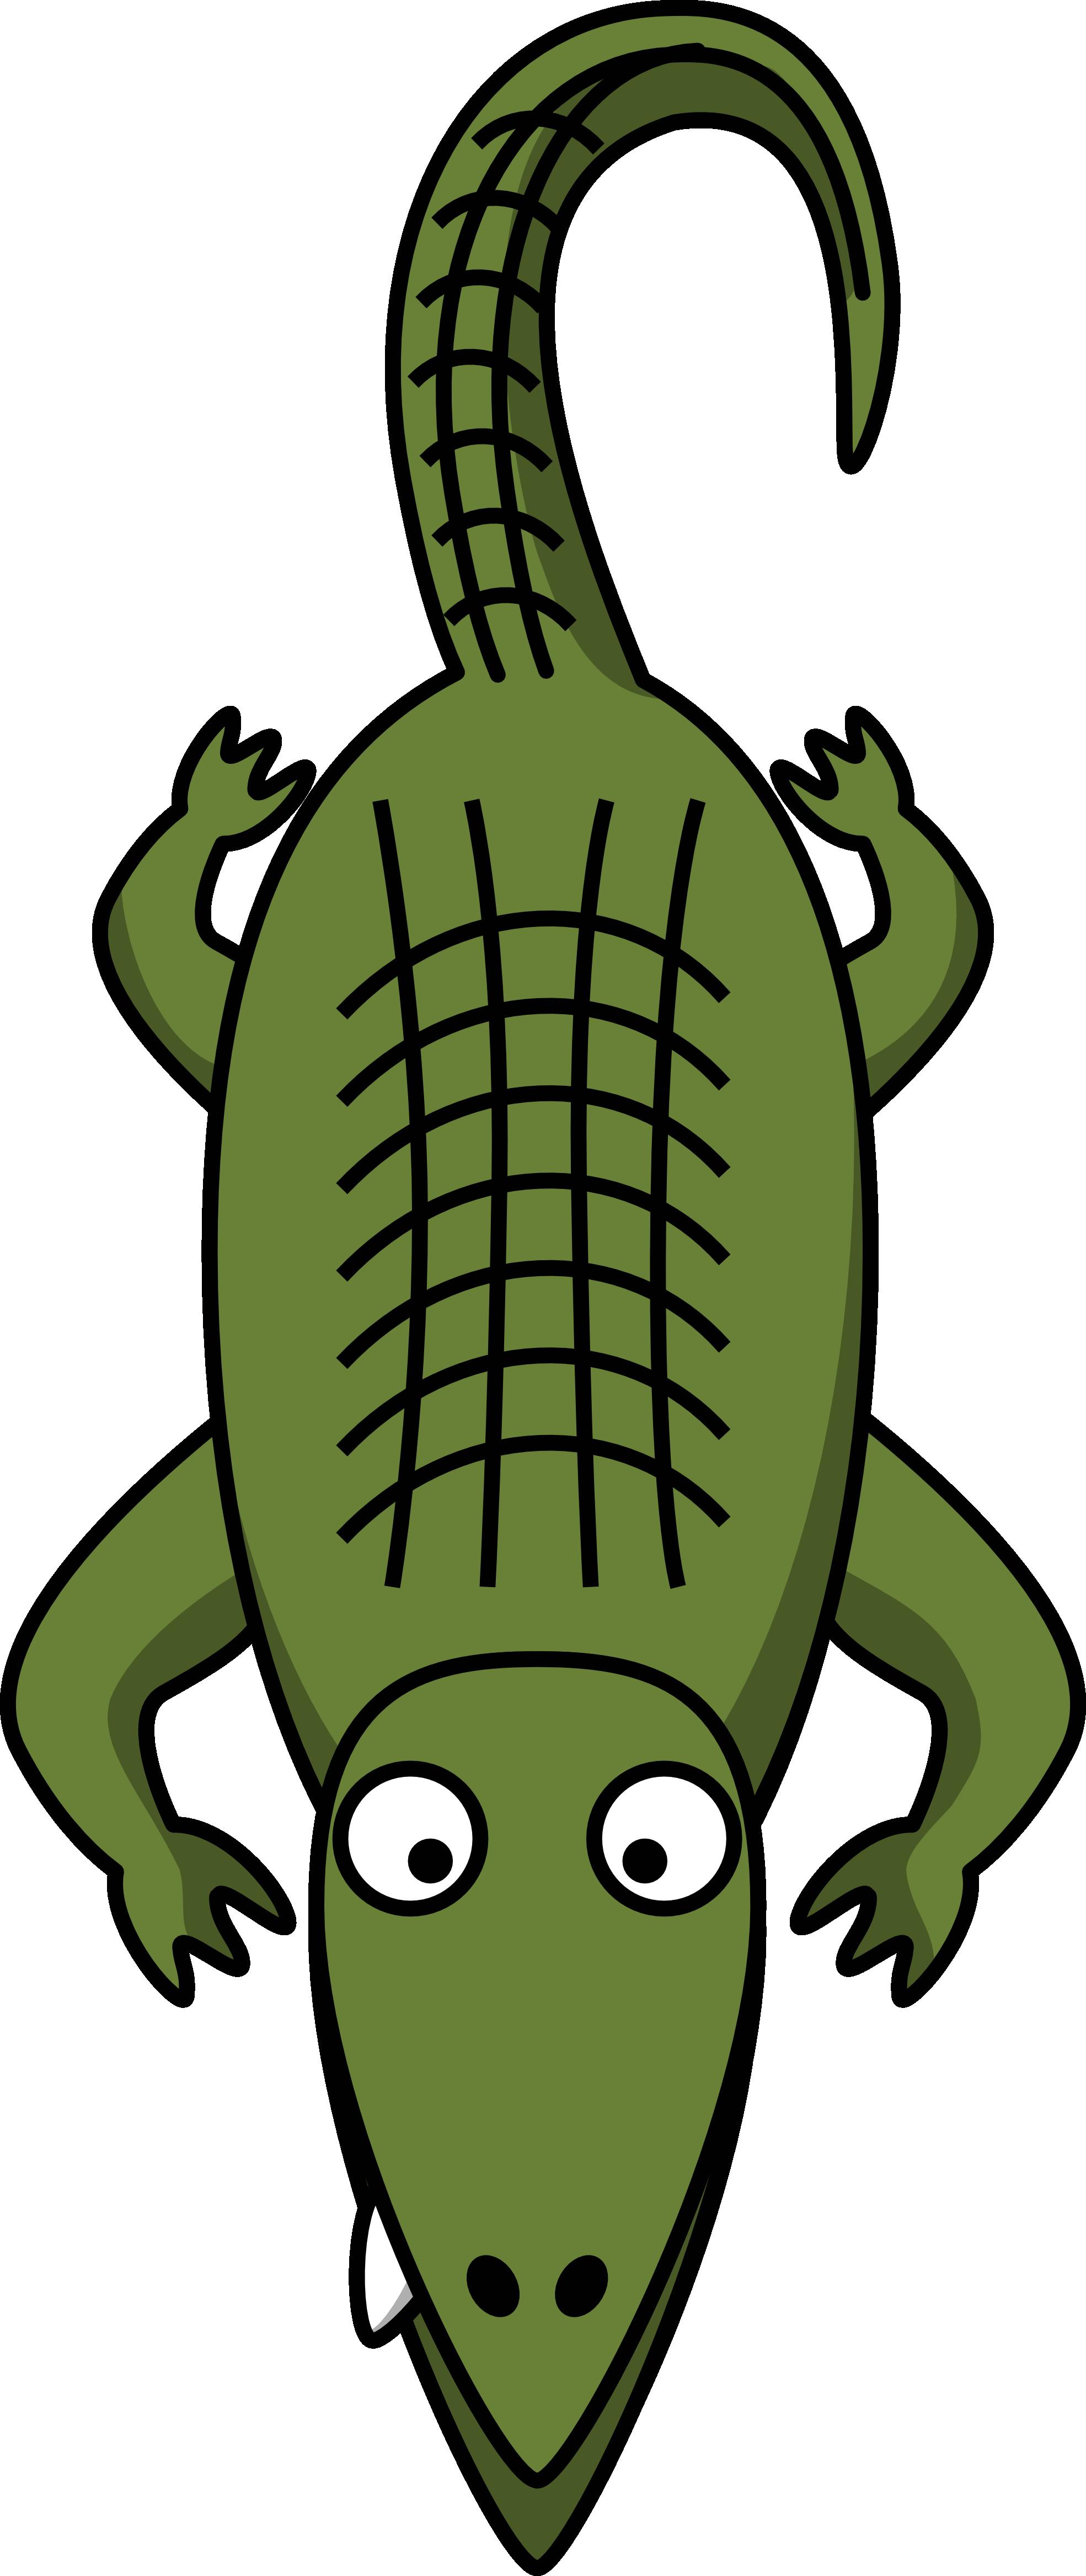 Crocodile clipart chibi Clip Free Cartoon Cartoon